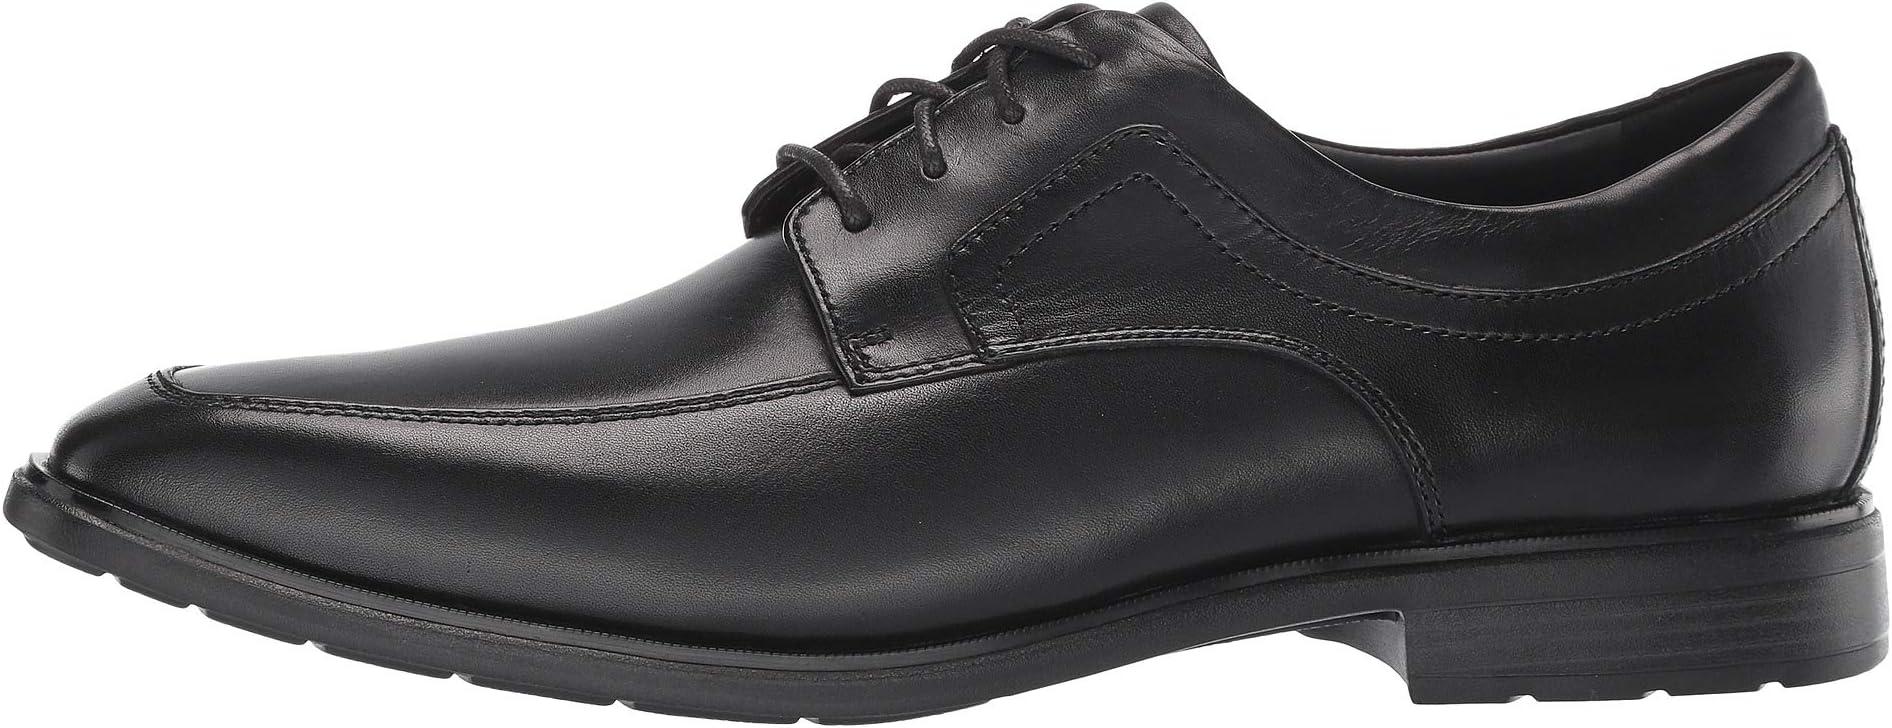 Rockport DresSports Business 2 Apron   Men's shoes   2020 Newest